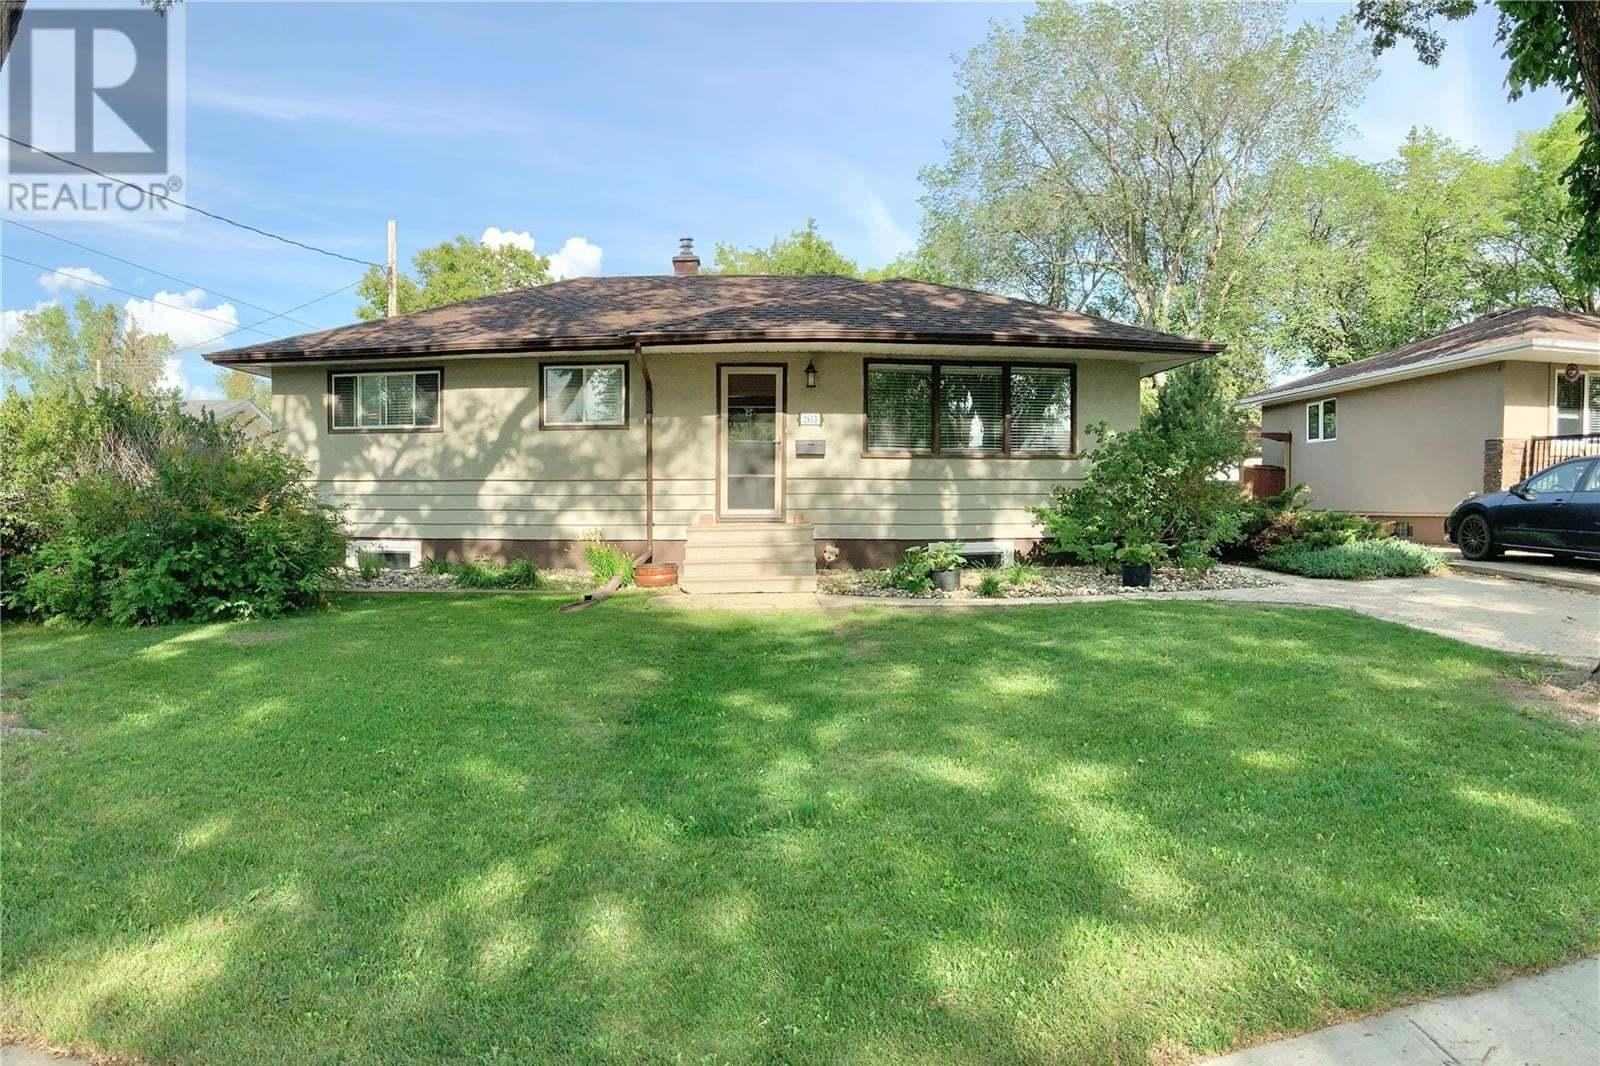 House for sale at 2813 Wascana St Regina Saskatchewan - MLS: SK827679